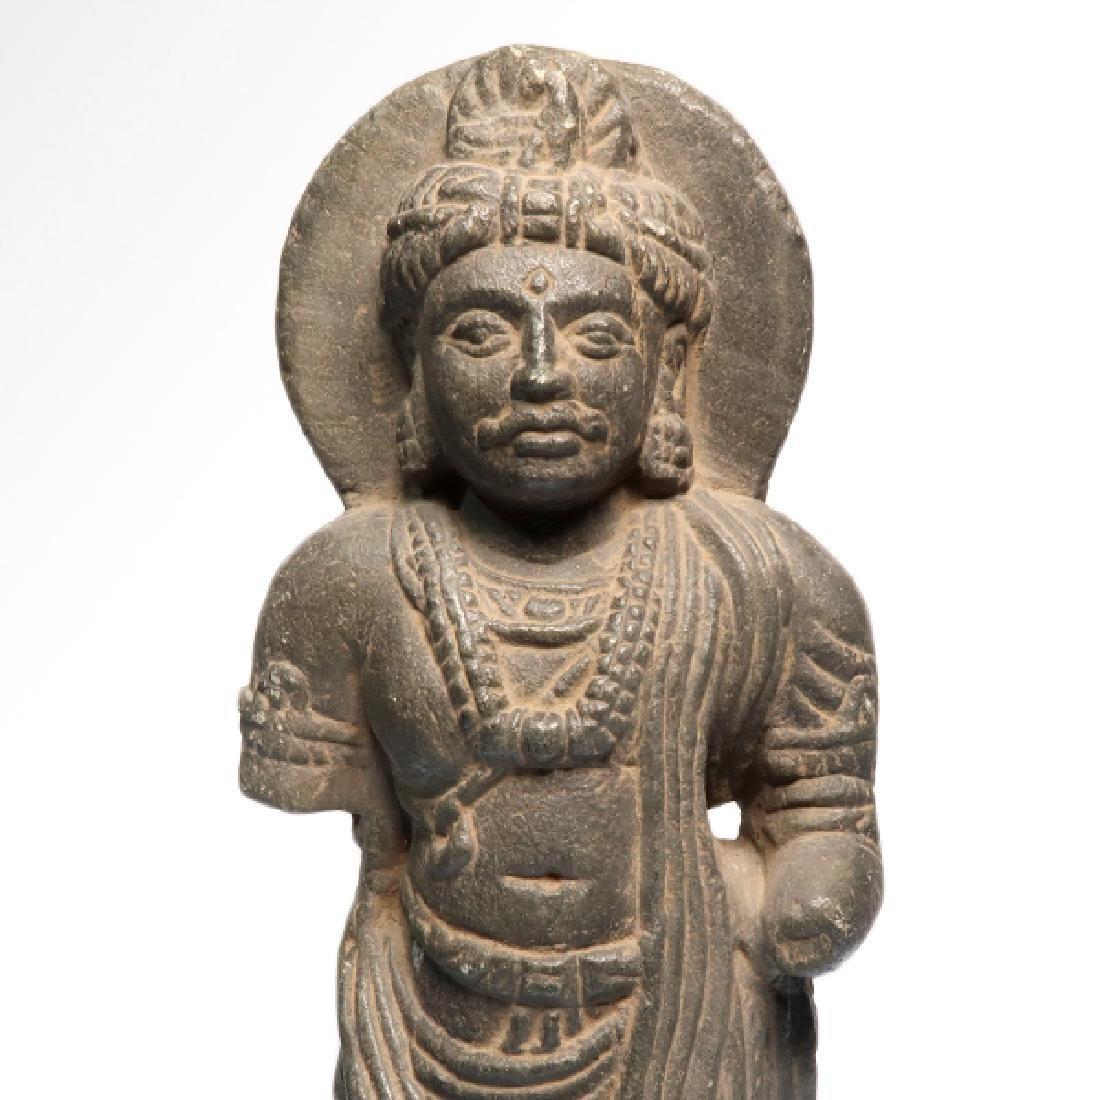 Gandhara Schist Figure of a Standing Buddha, c. 2nd-3rd - 3